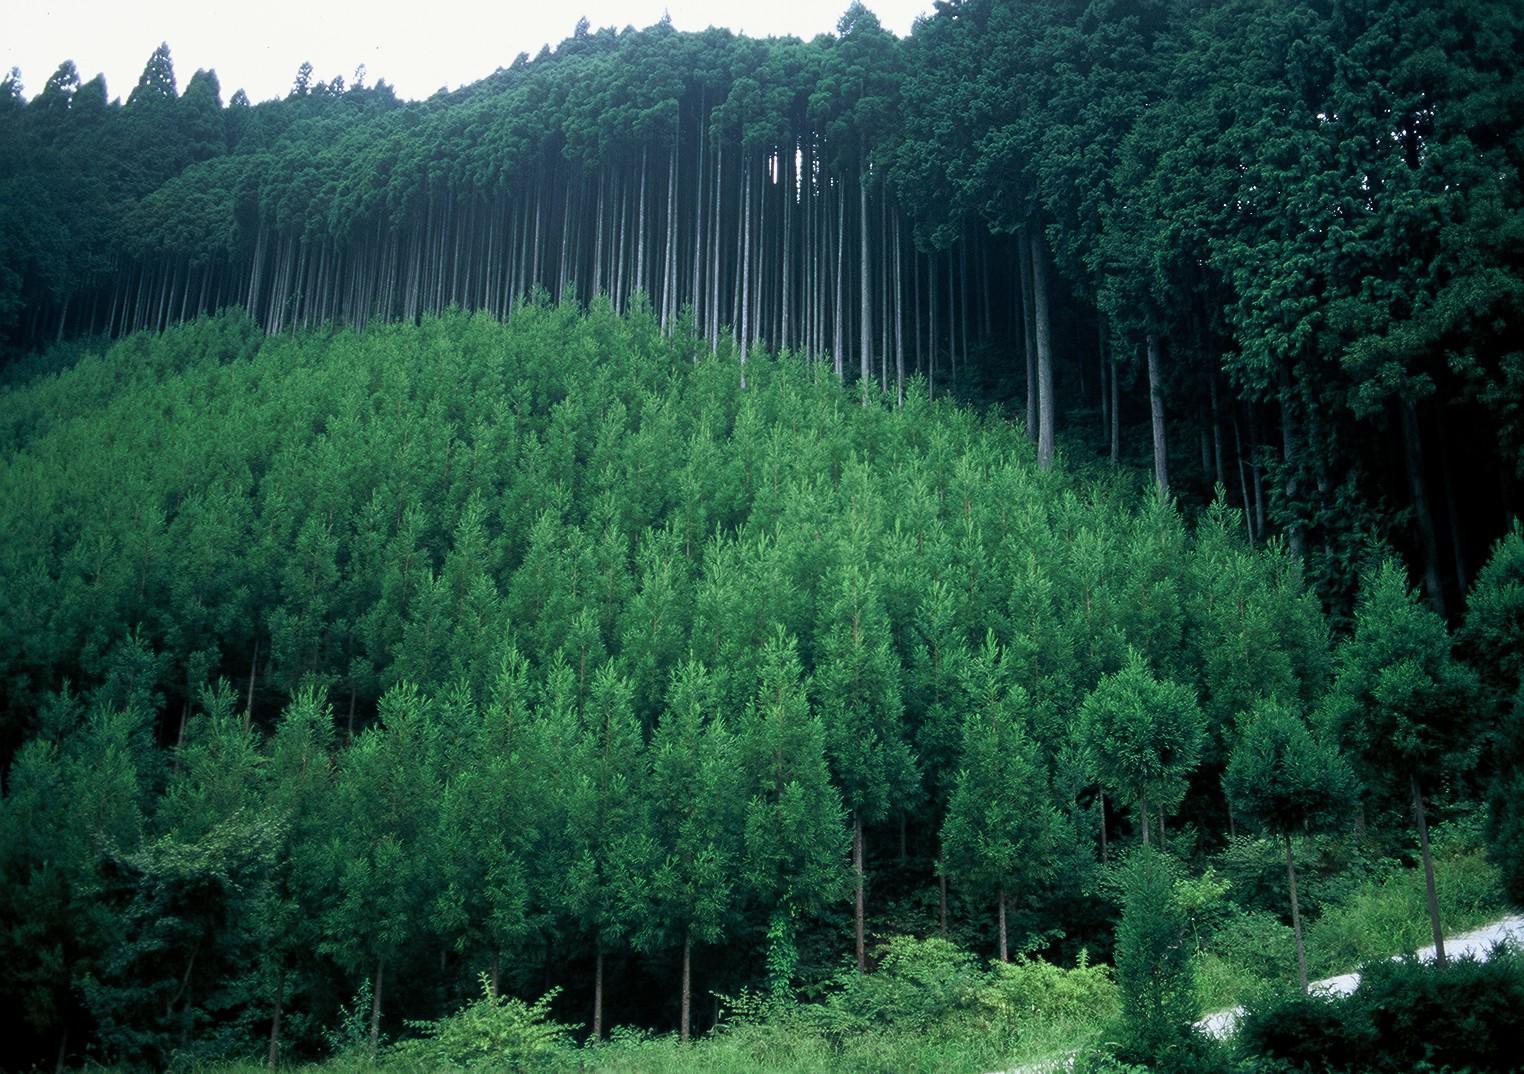 BioCarbon Engineering-Planting 1 billion trees using drones